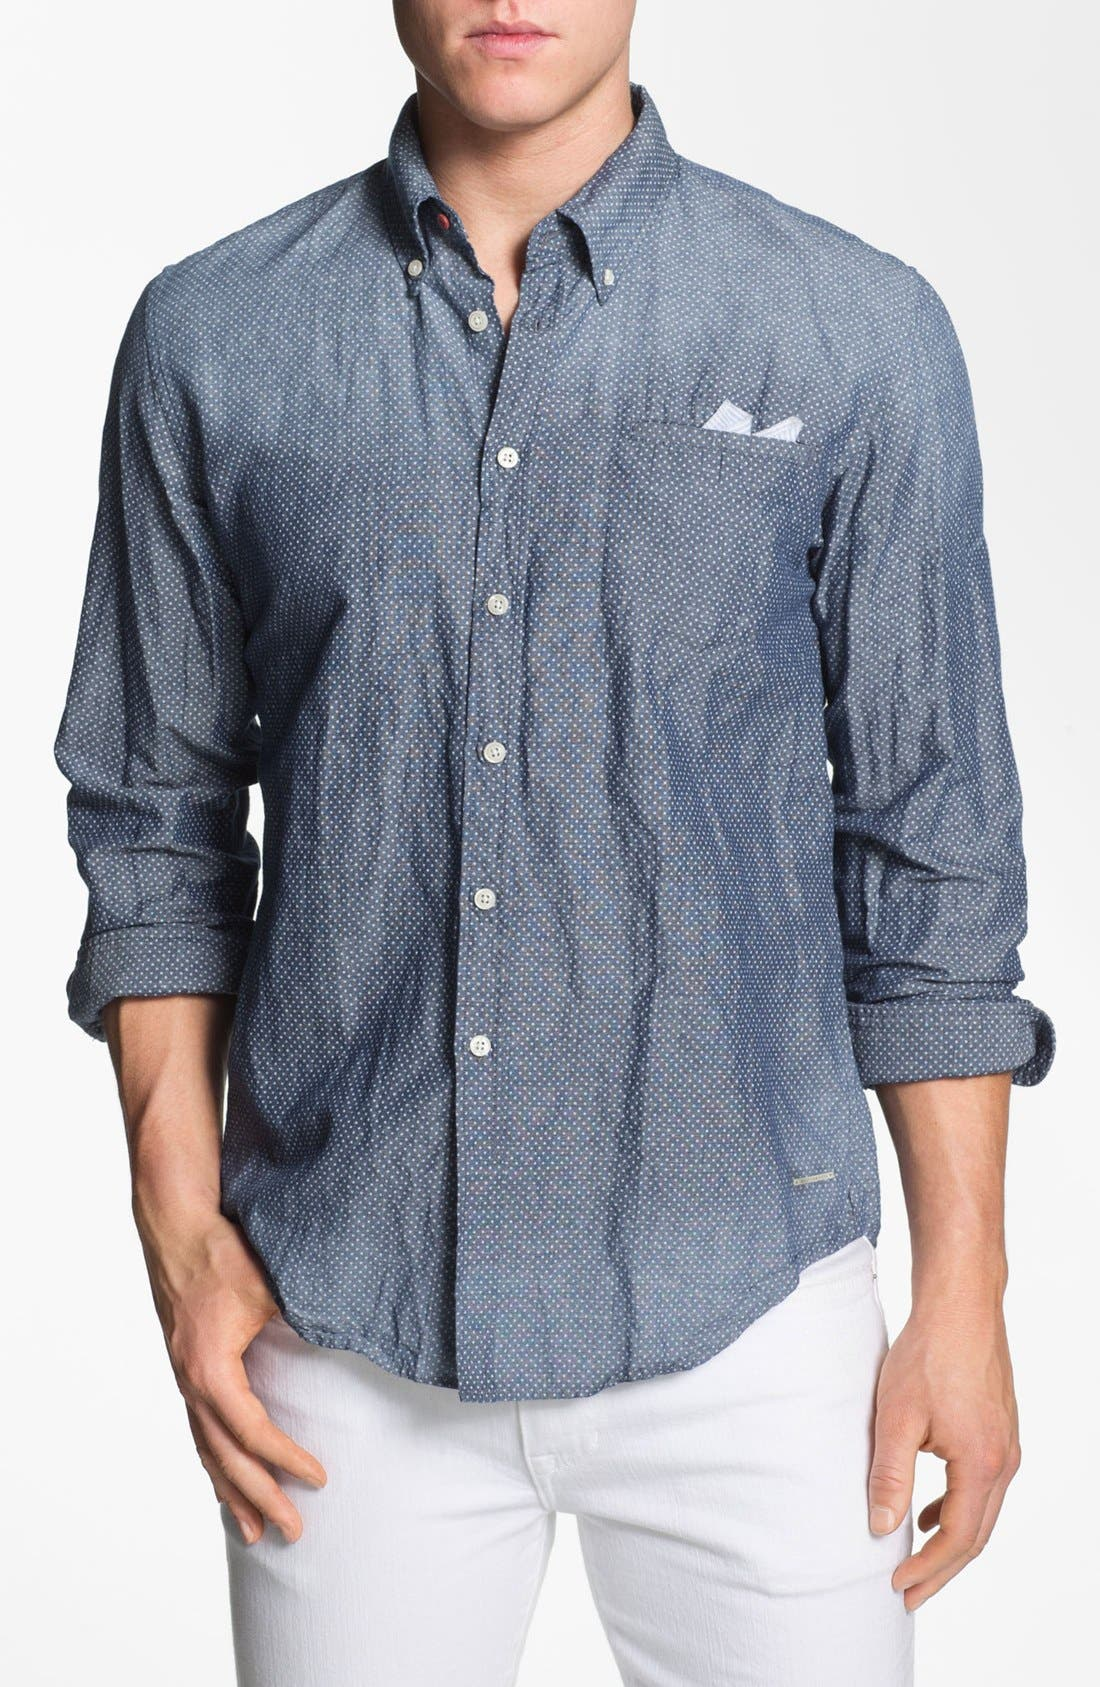 Alternate Image 1 Selected - Scotch & Soda Trim Fit Chambray Shirt